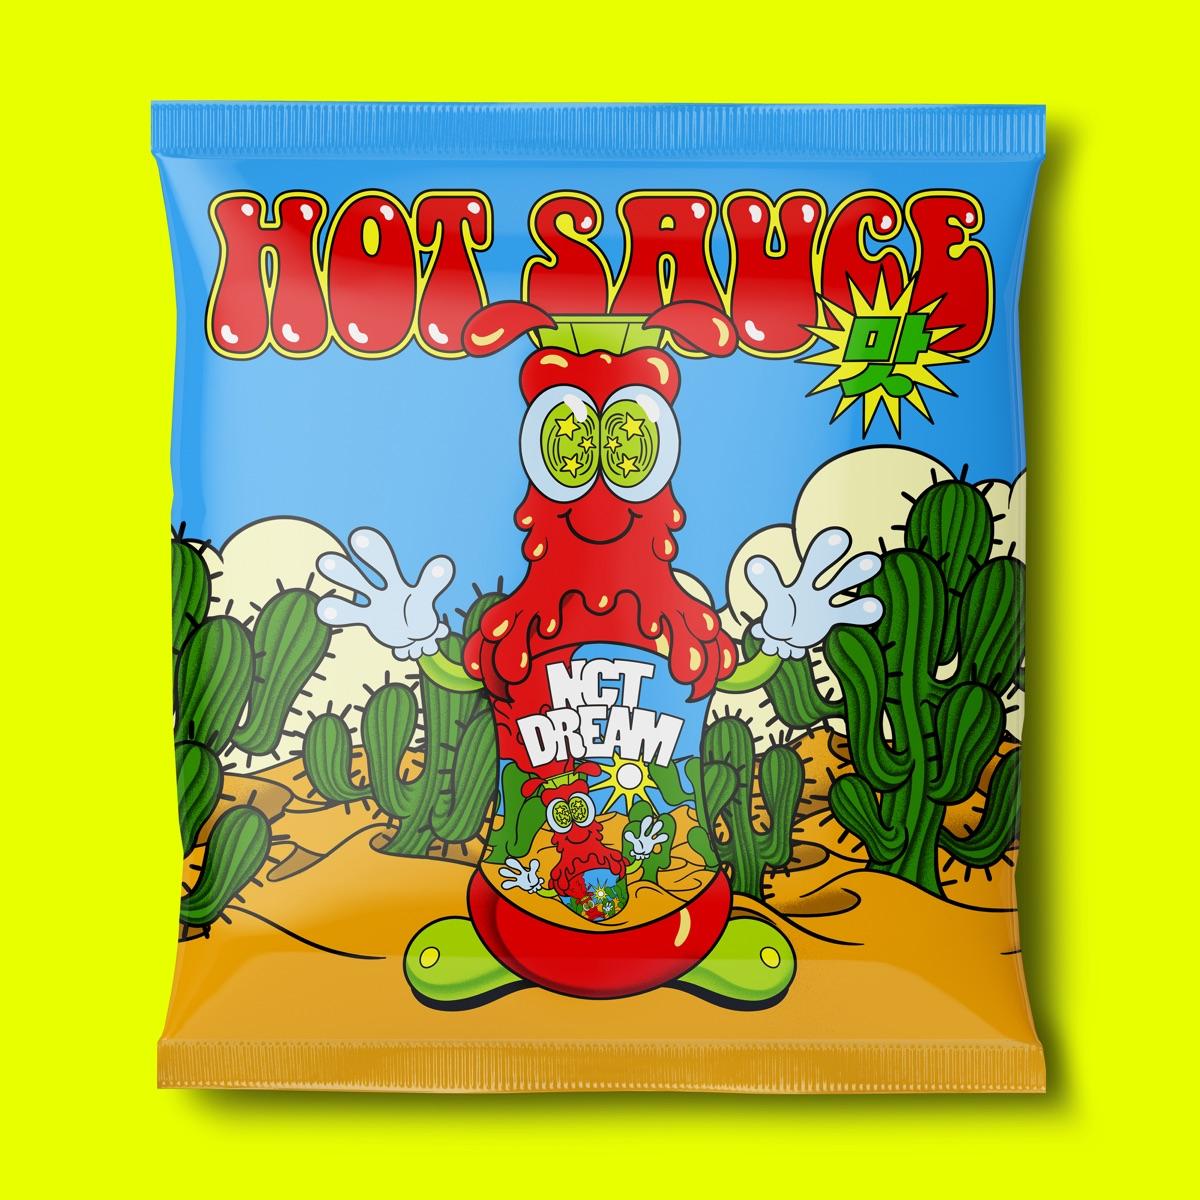 『NCT DREAM - Hot Sauce』収録の『Hot Sauce - The 1st Album』ジャケット